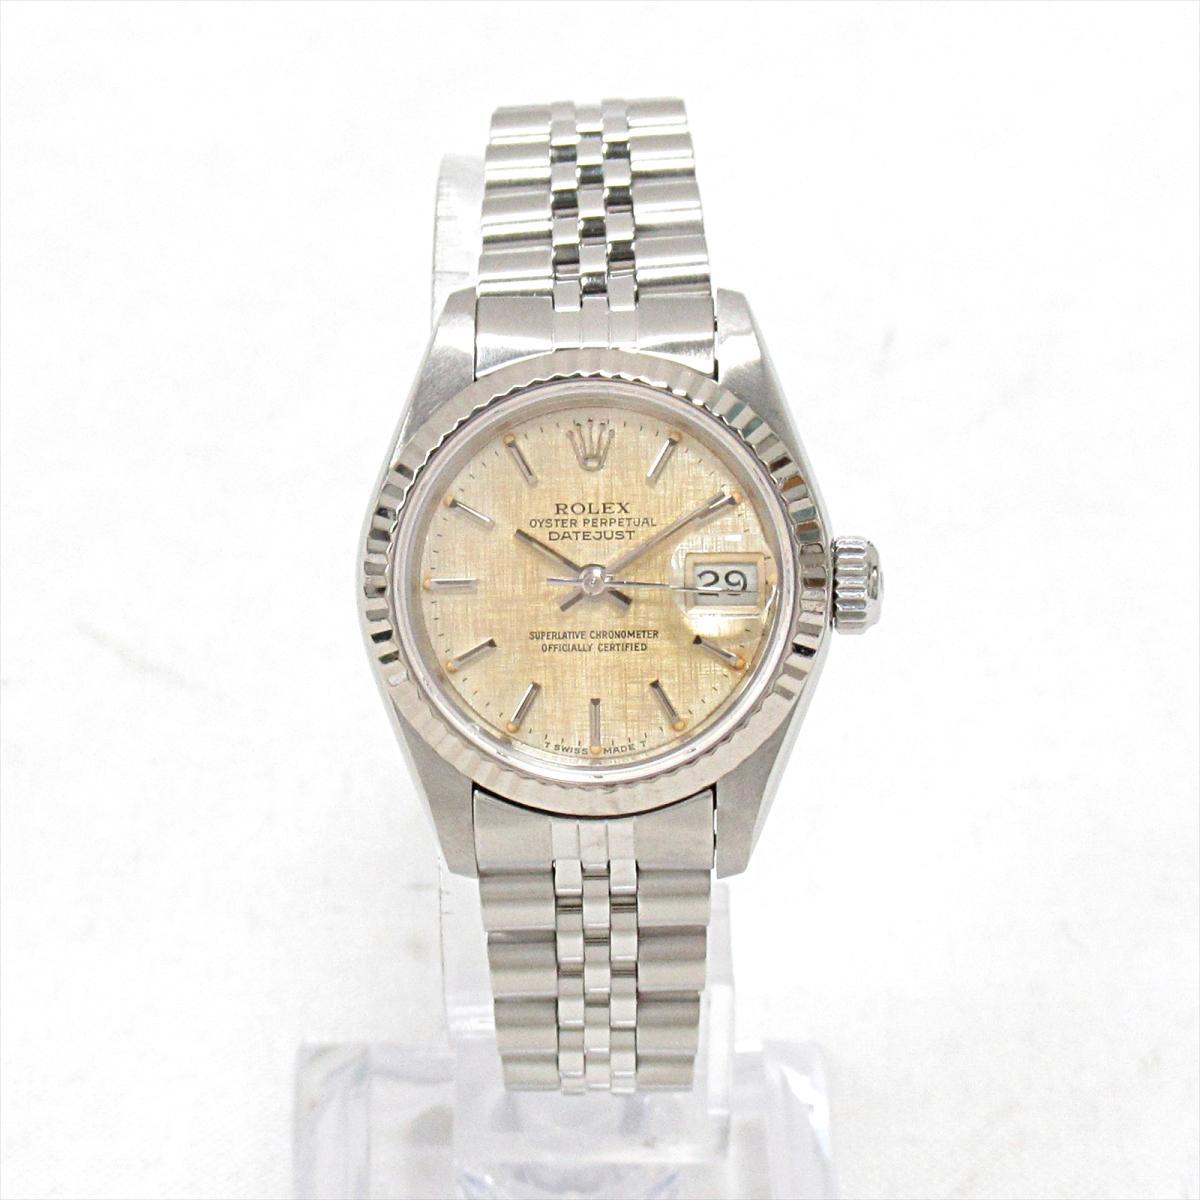 ROLEX 時計 69174 デイトジャスト 腕時計 ウォッチ